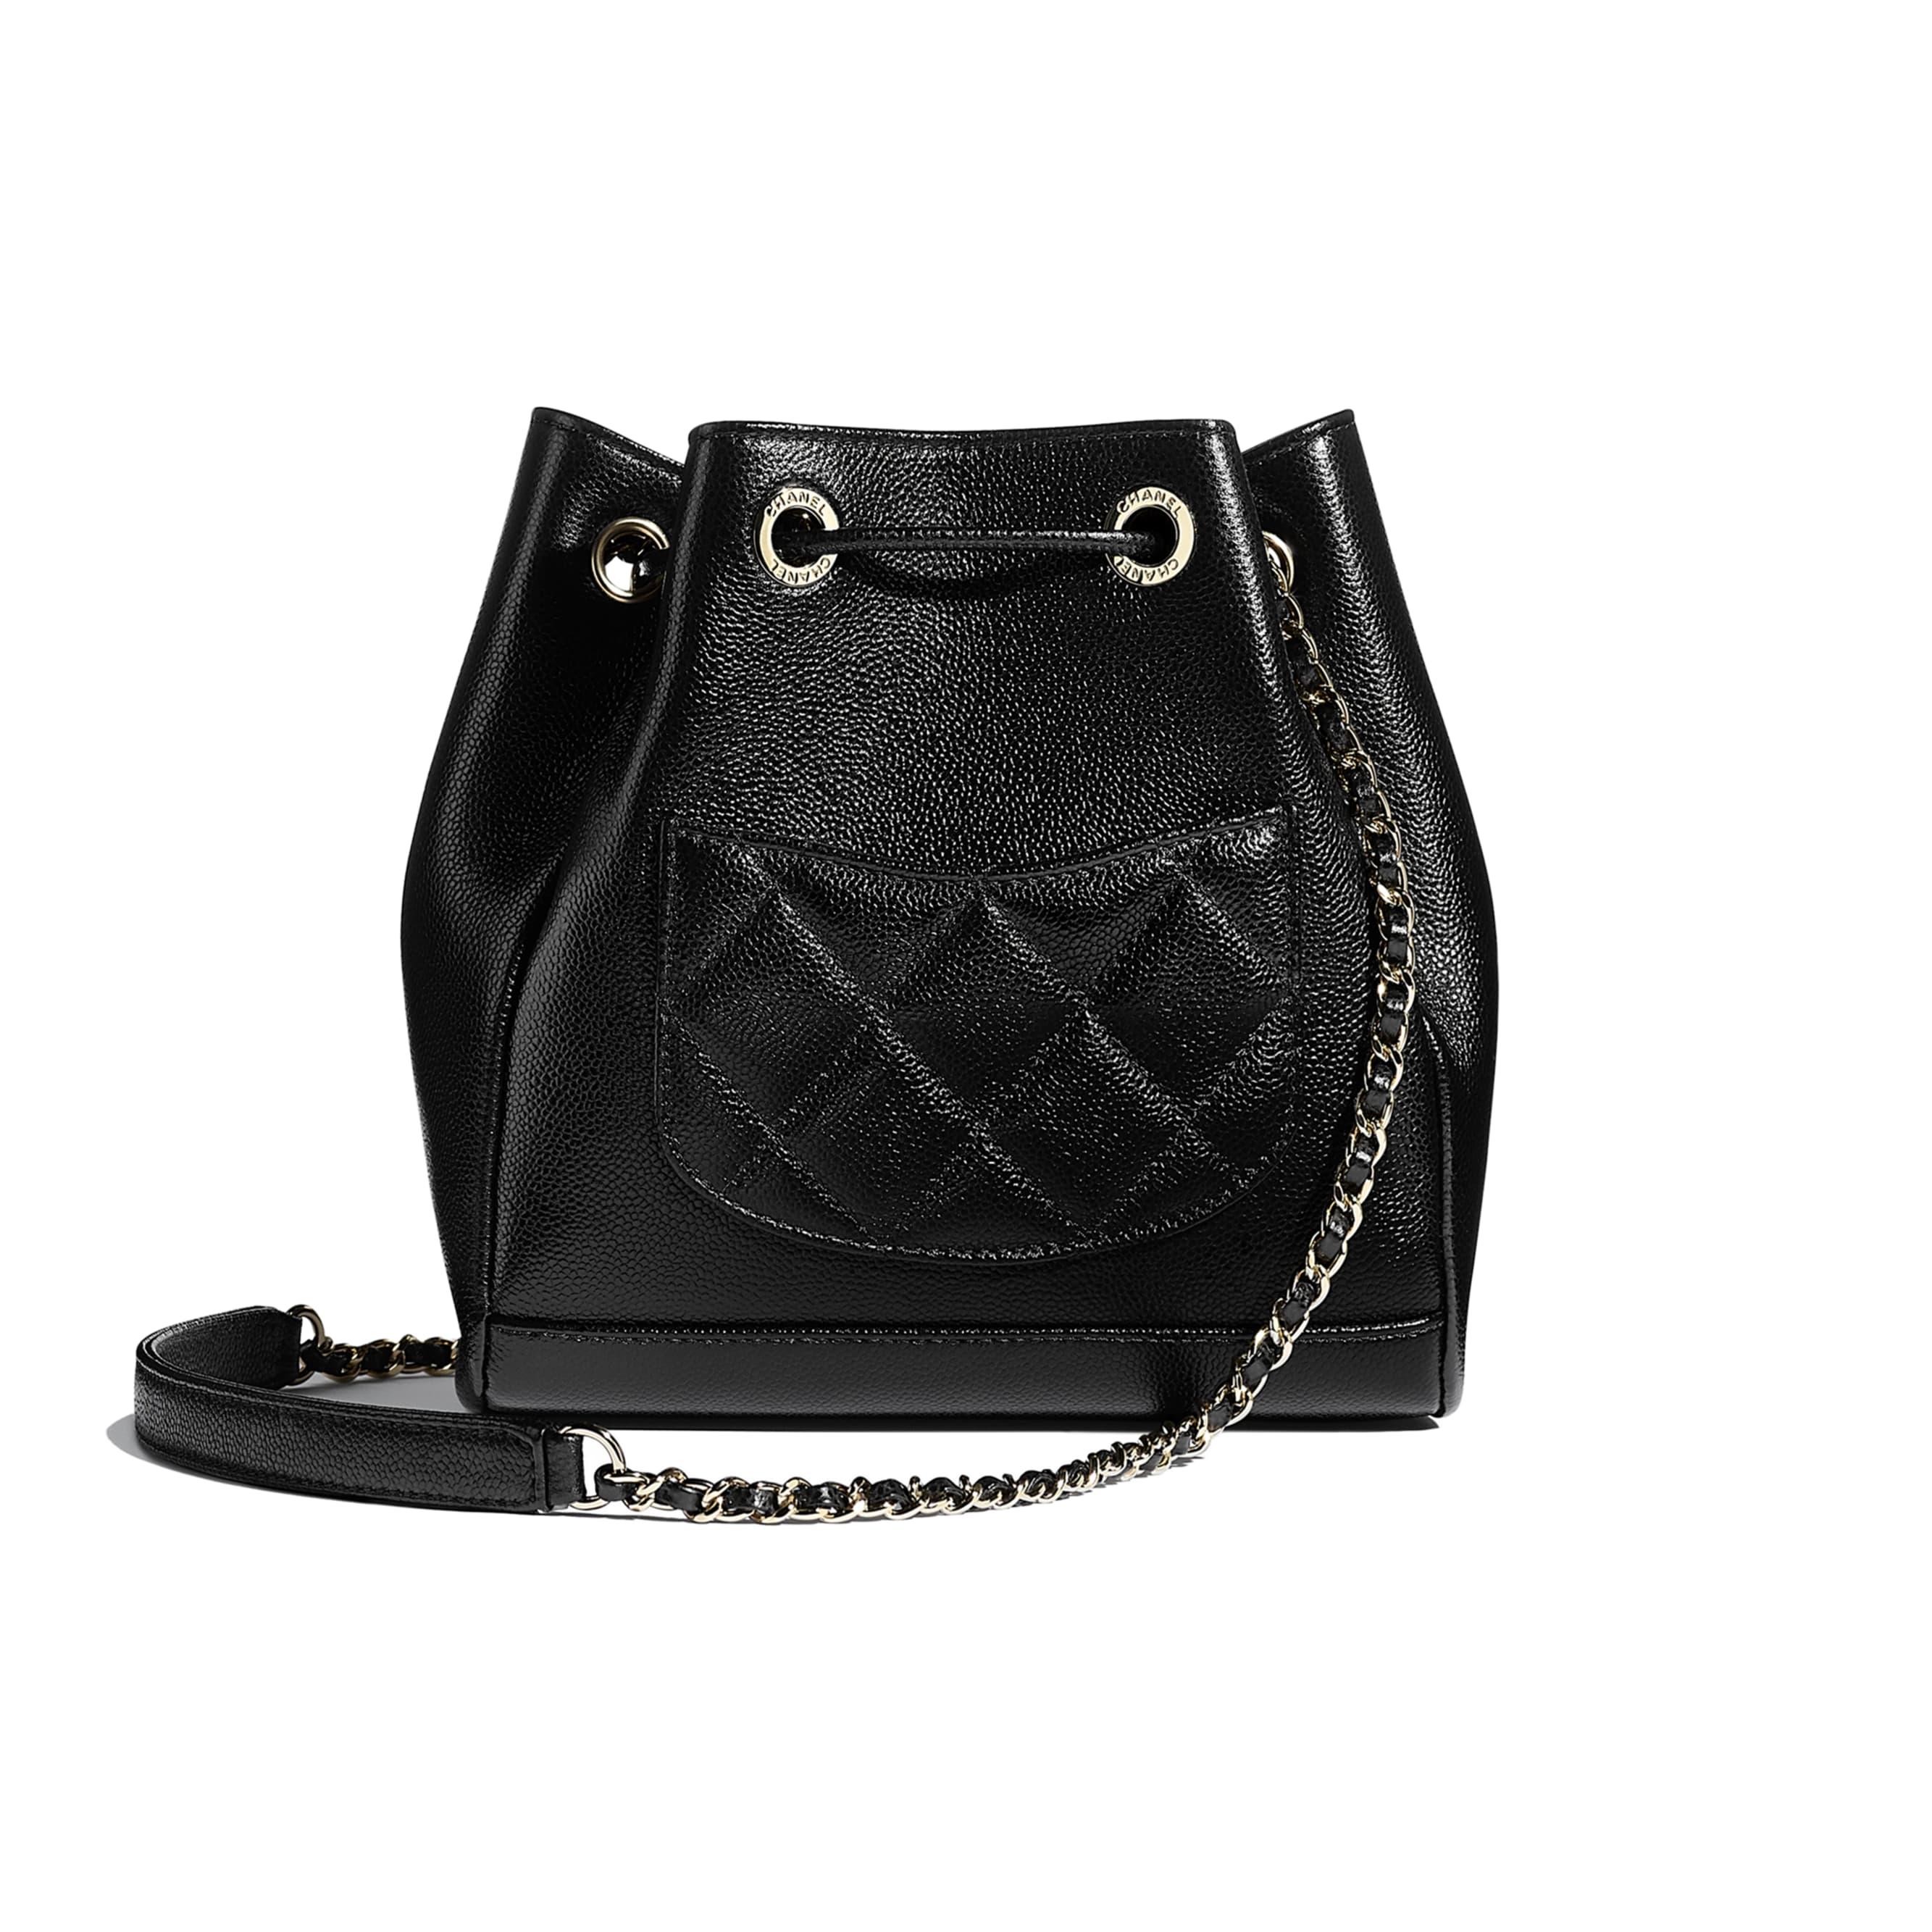 Bucket Bag - Black - Grained Calfskin & Gold-Tone Metal - CHANEL - Alternative view - see standard sized version